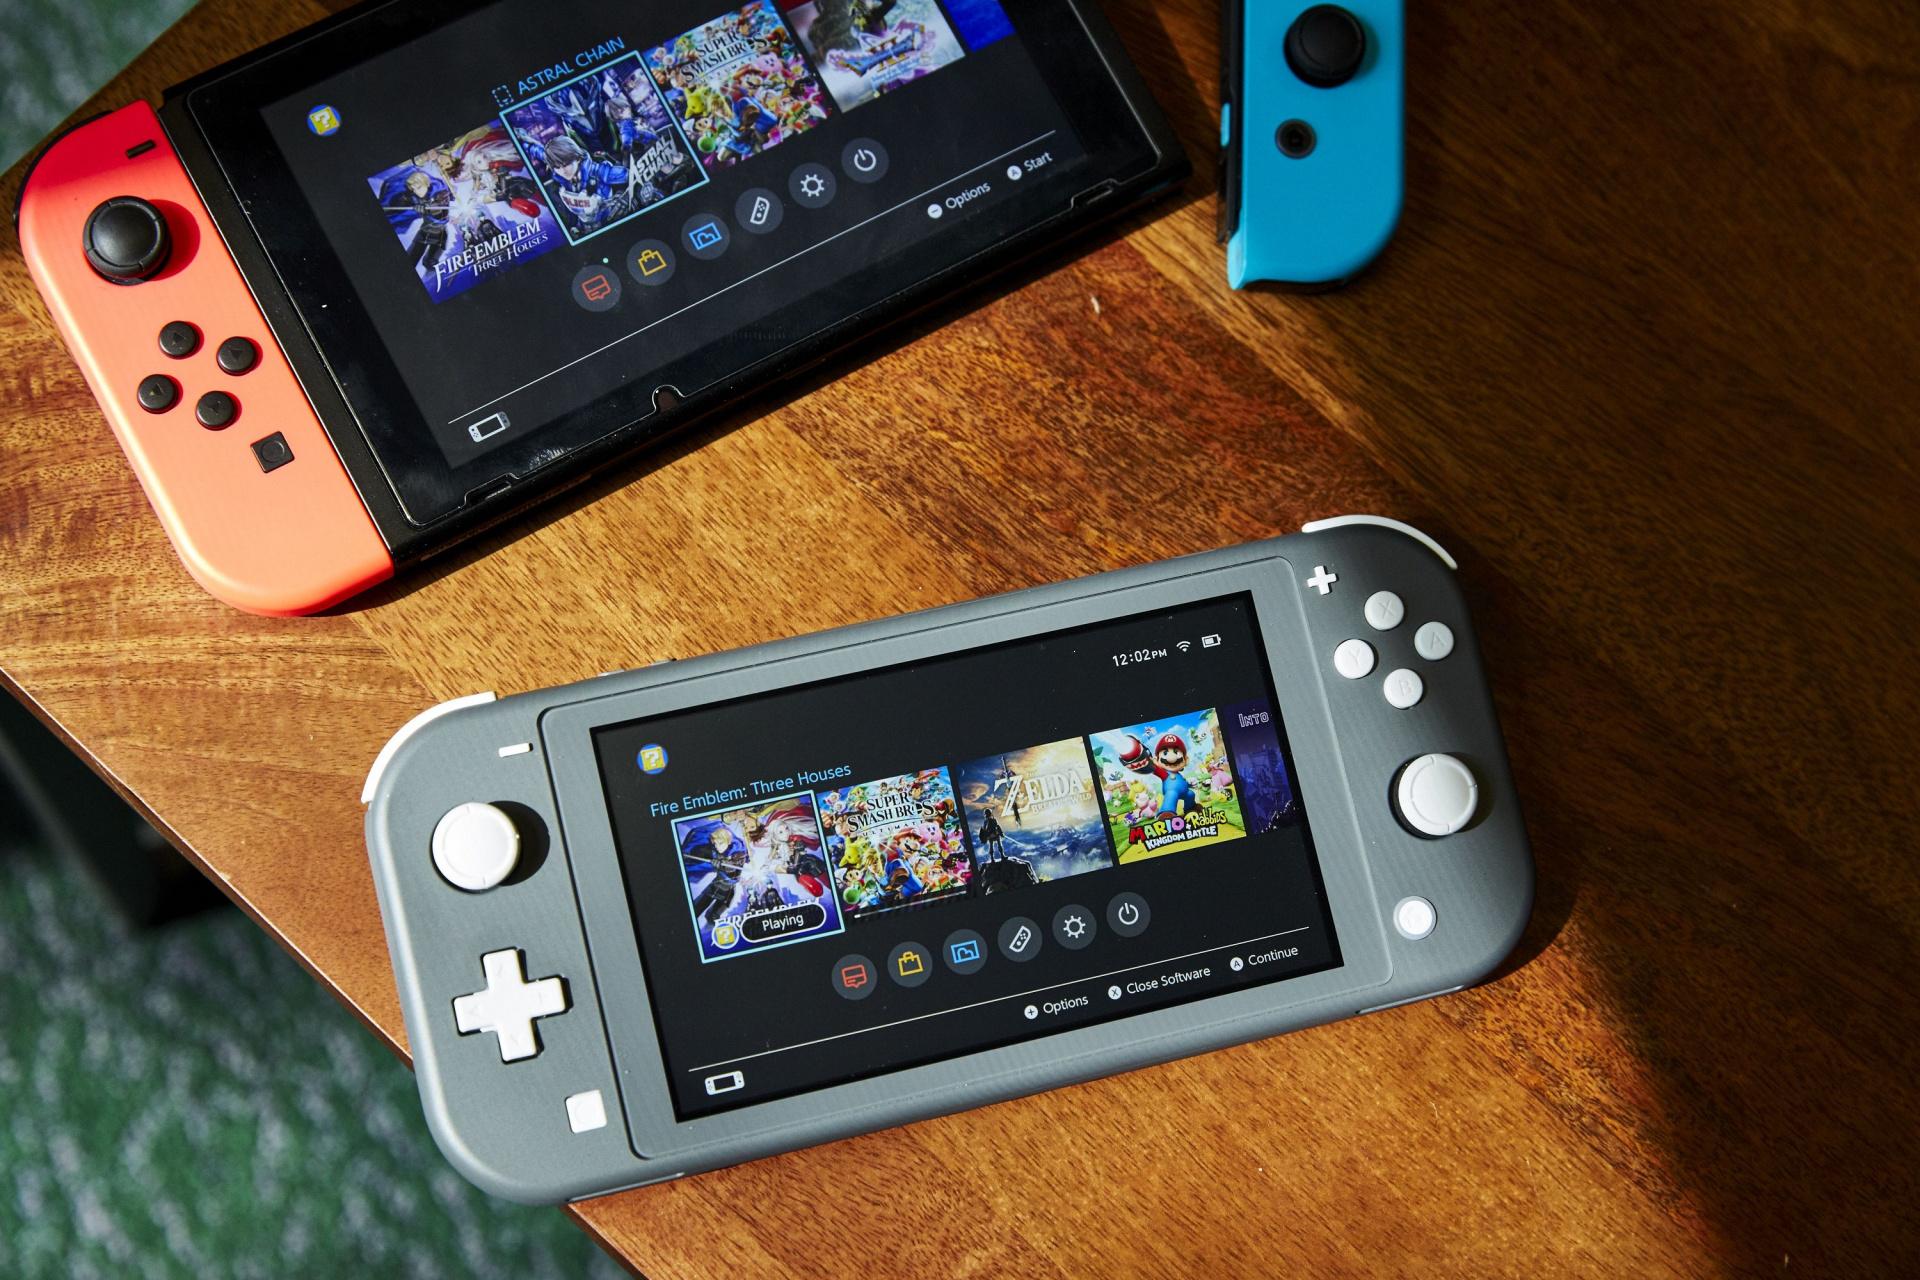 СМИ: Nintendo анонсирует Switch Pro незадолго до выхода